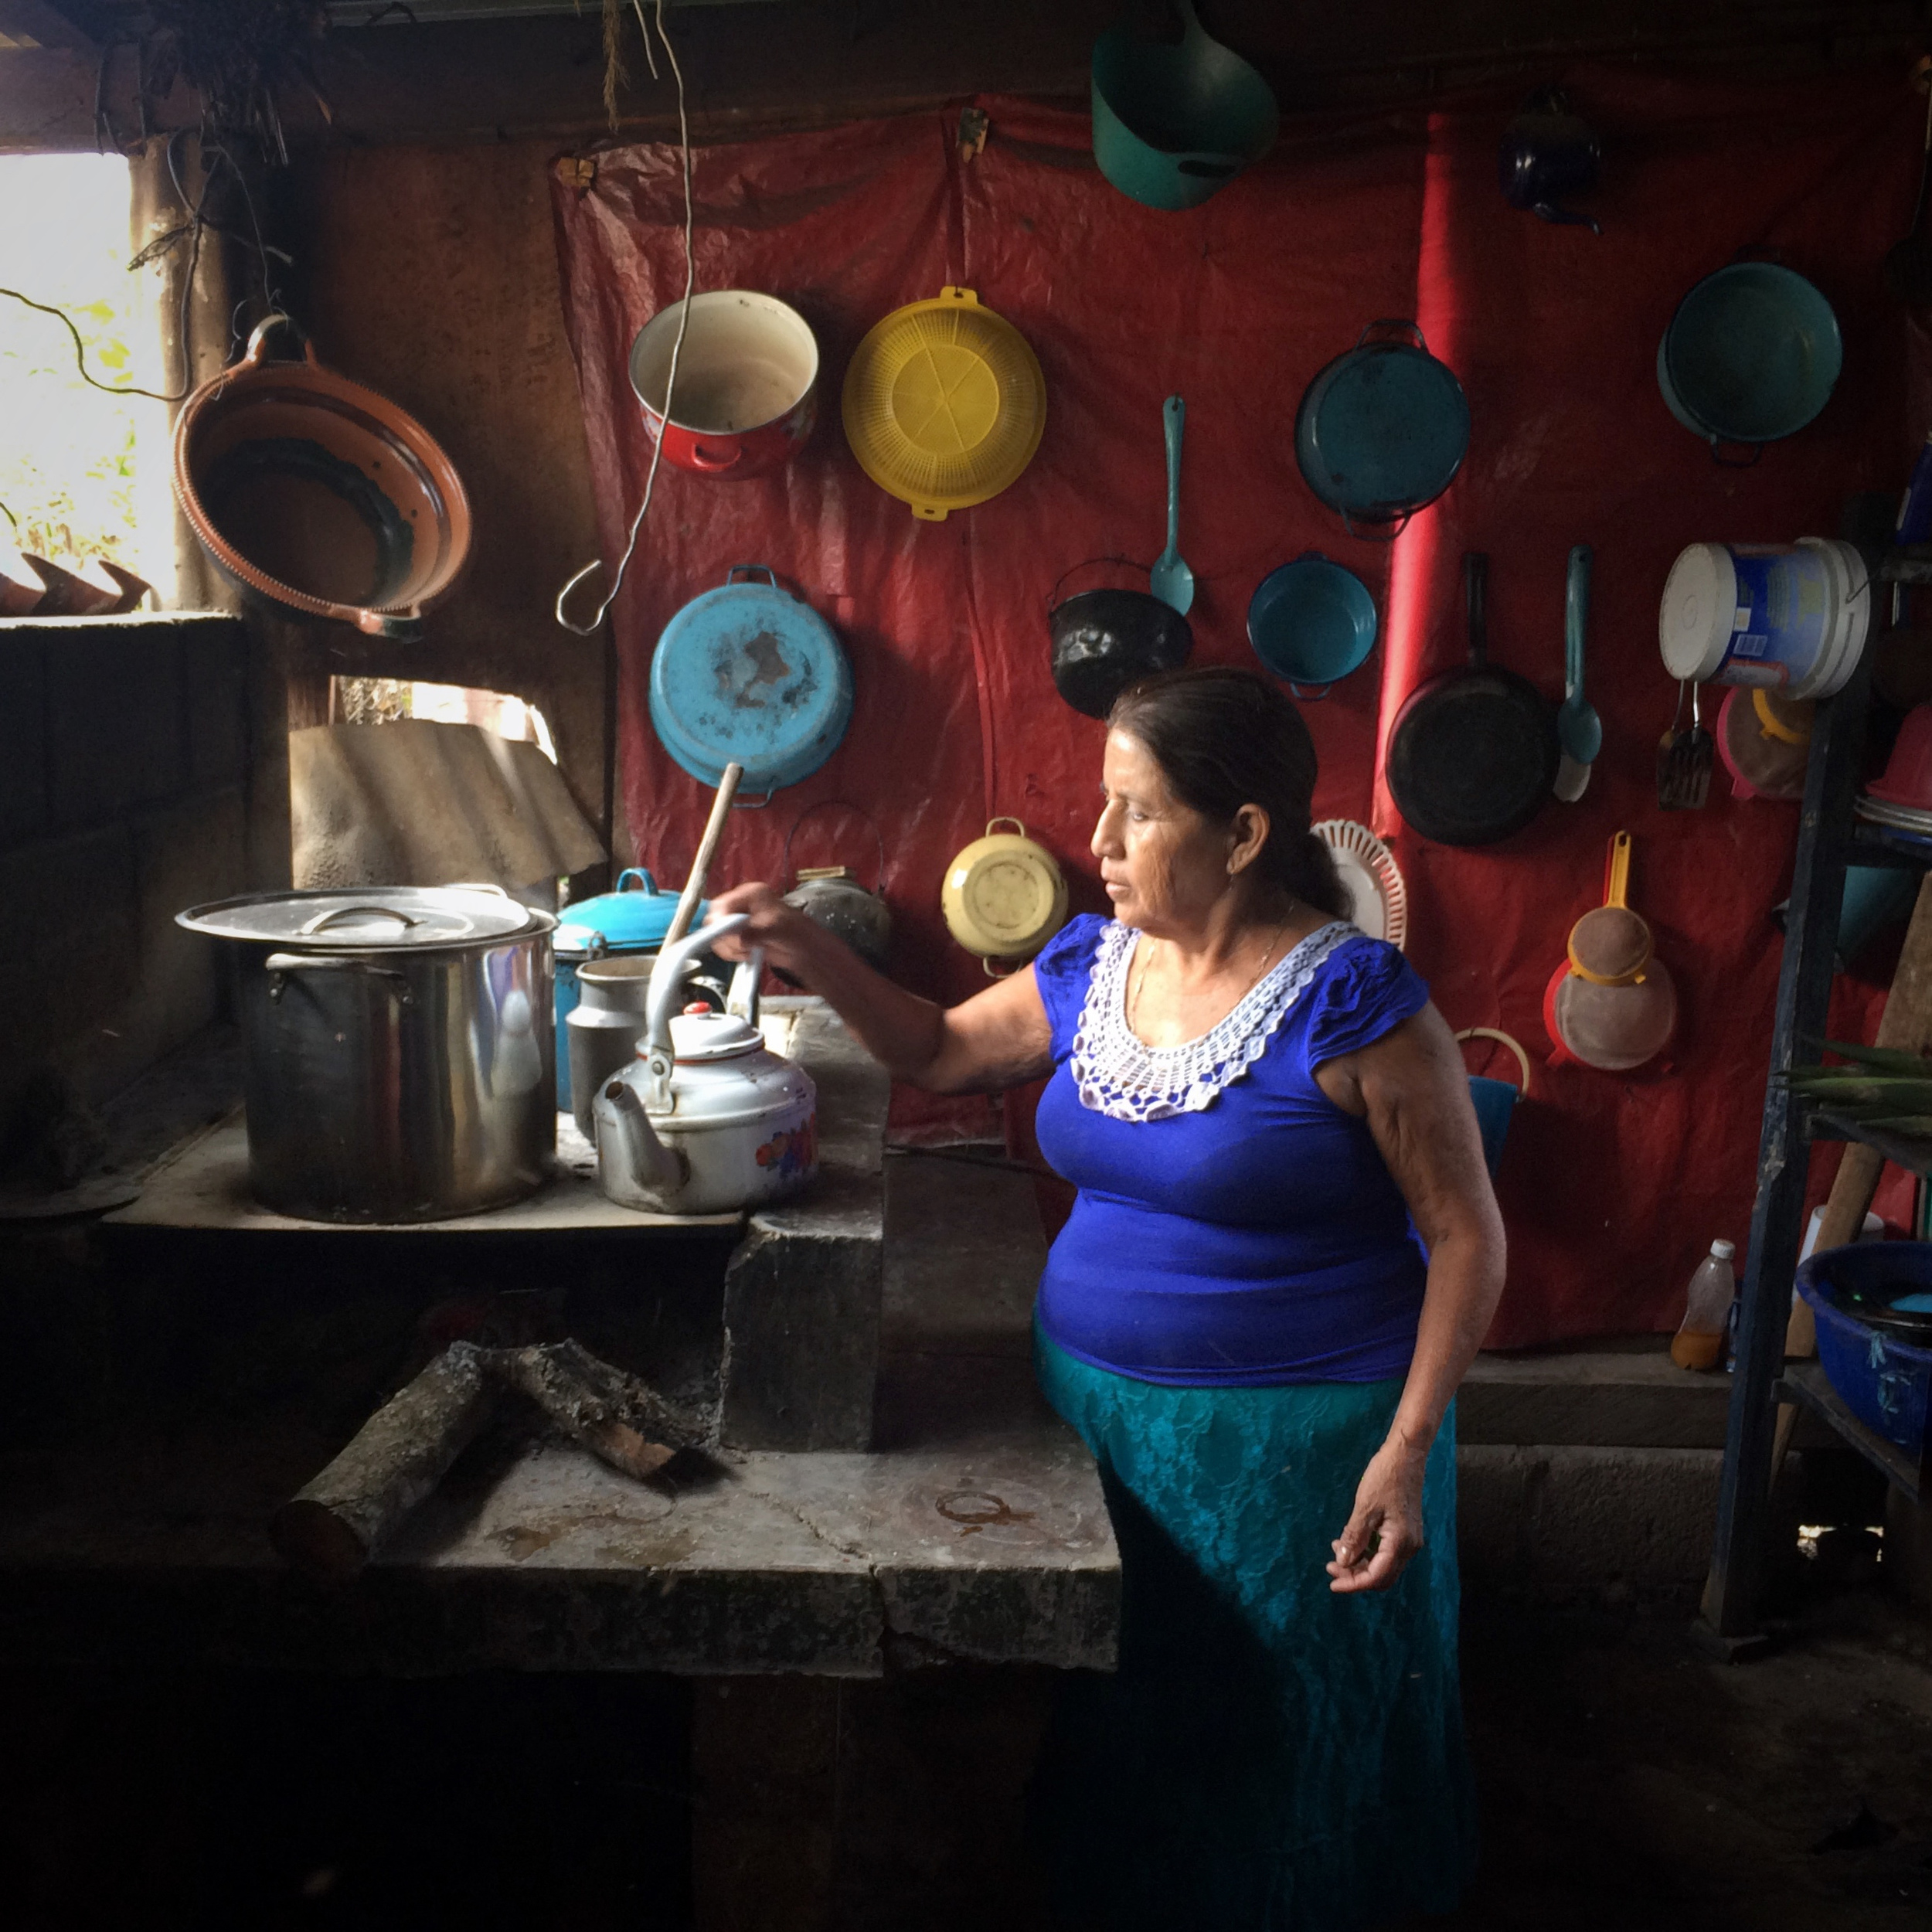 Siria Velazquez Ramirez, 61, pours coffee at home. Montebello Altamirano, Angel Albino Corzo, Chiapas, Mexico. December 9, 2015. (James Rodriguez)